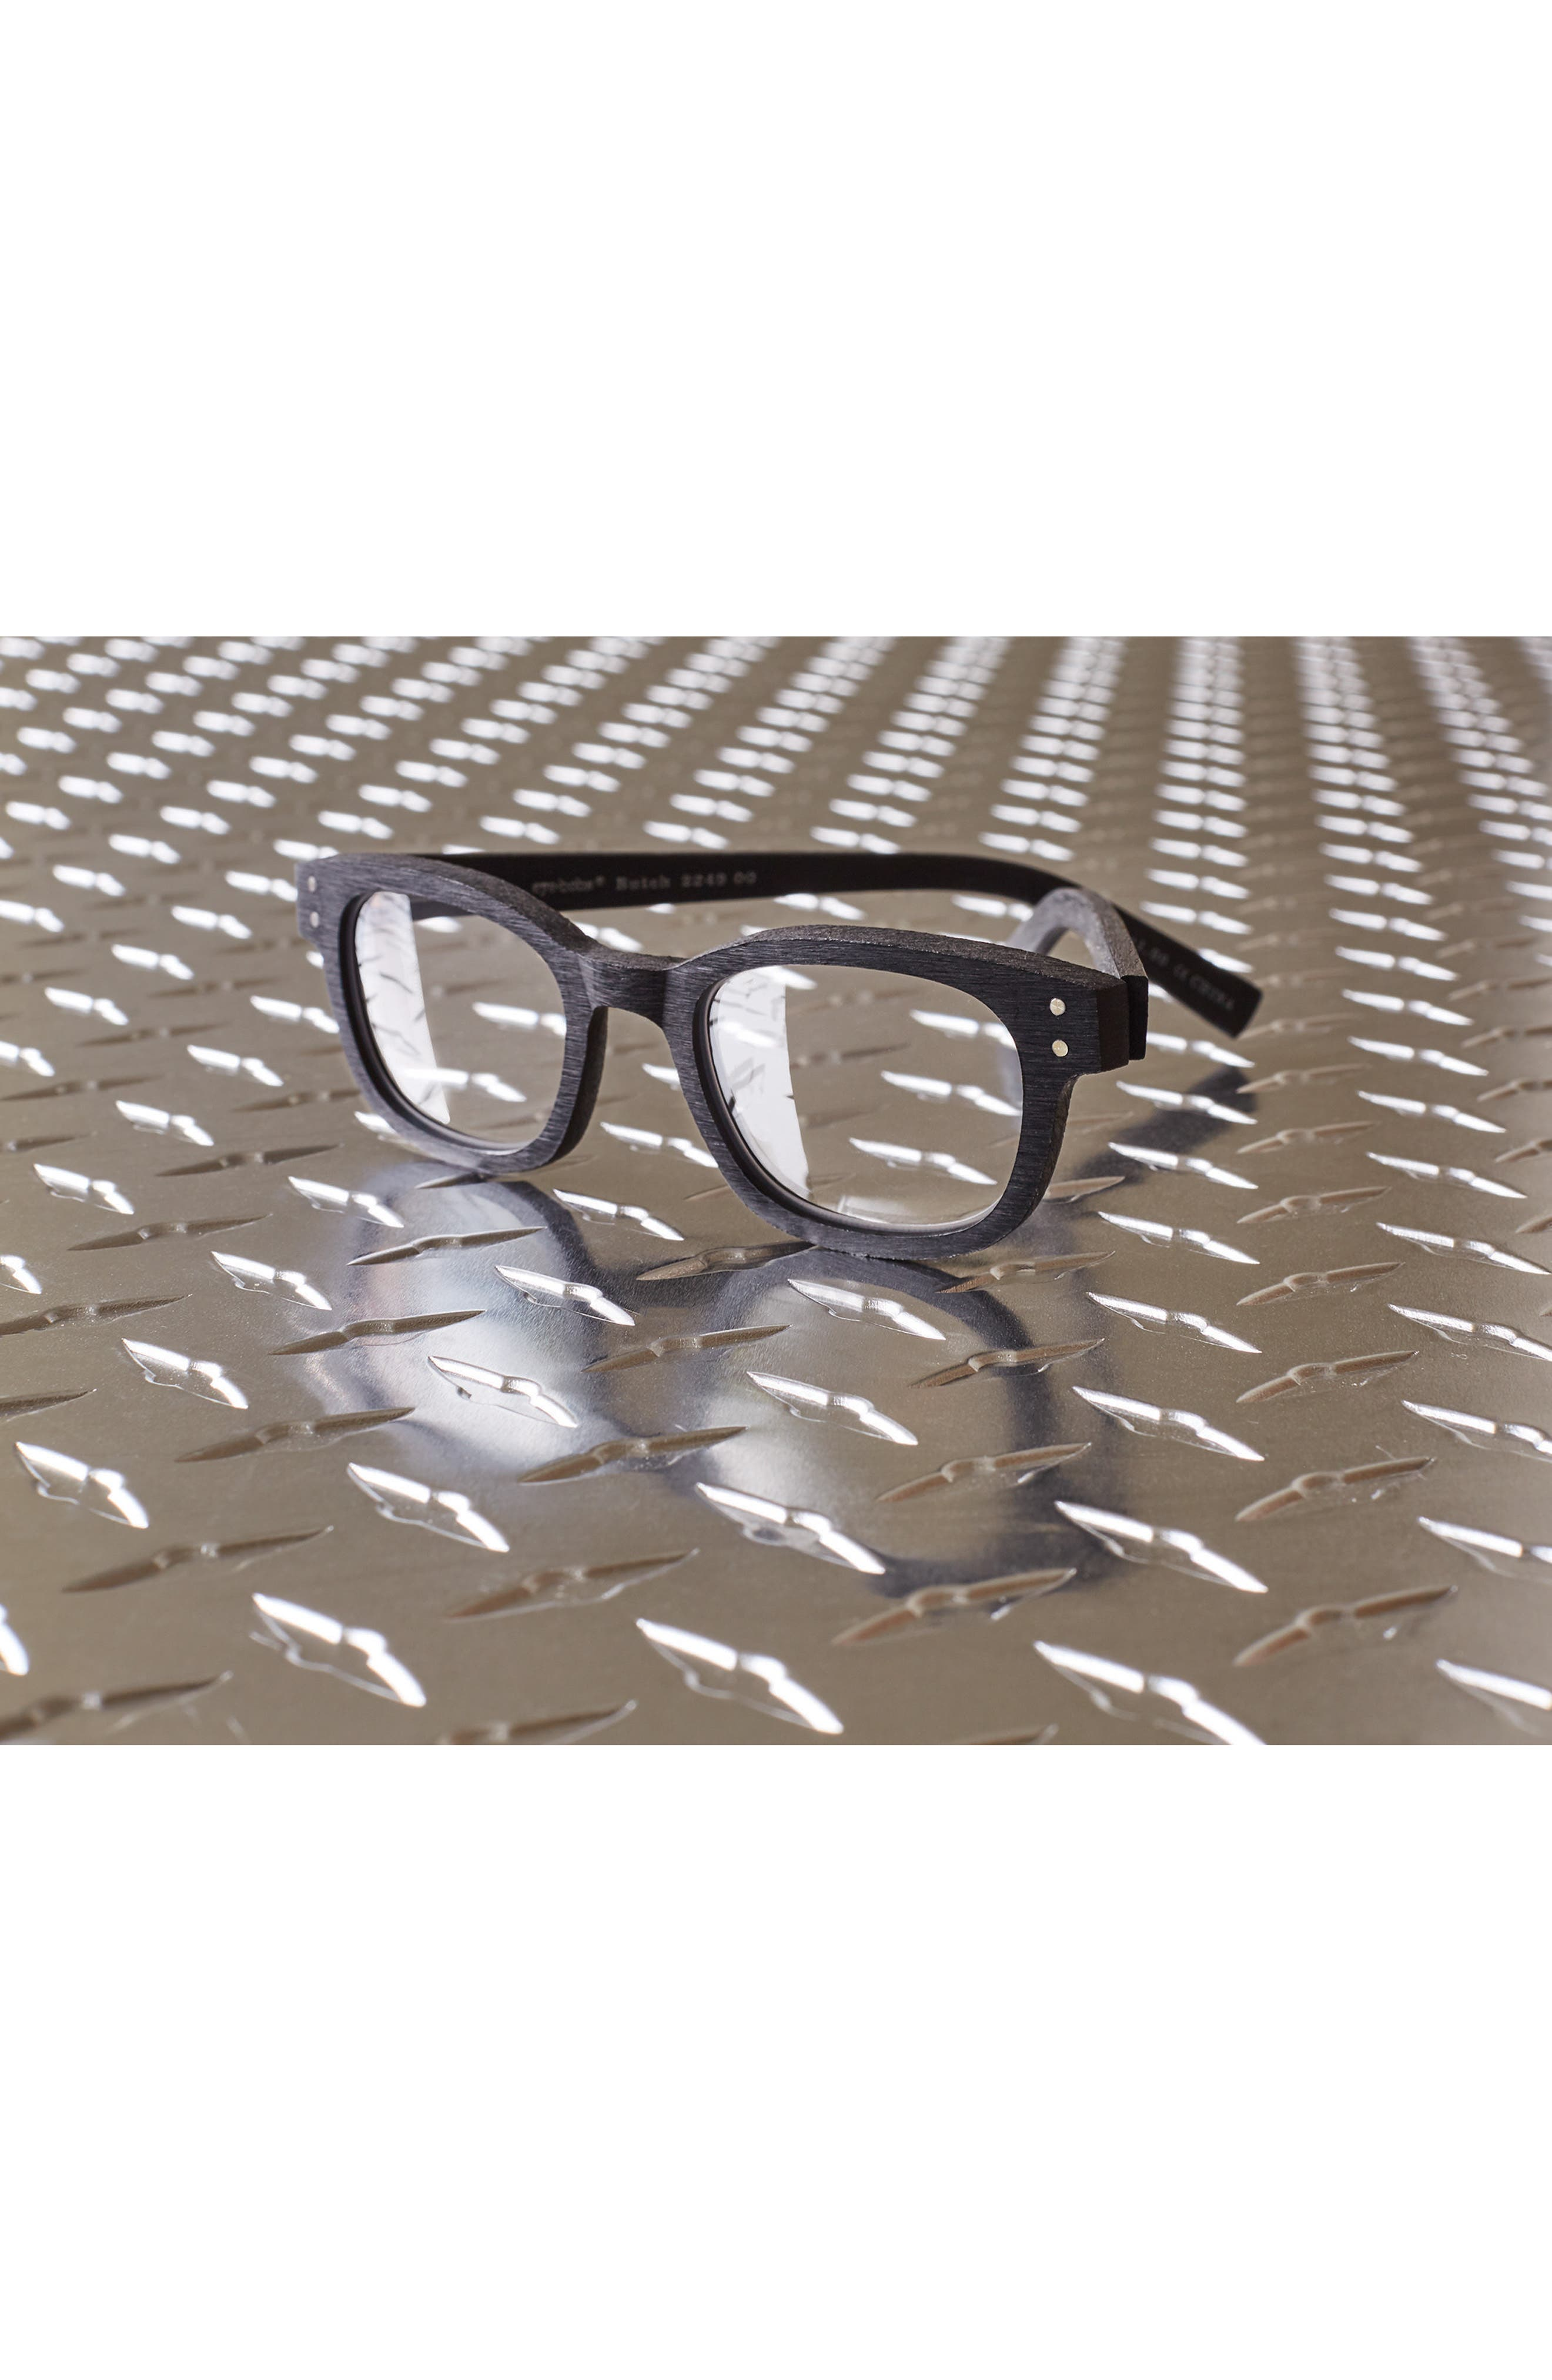 Butch 45mm Reading Glasses,                             Alternate thumbnail 3, color,                             MATTE BLACK WOODGRAIN